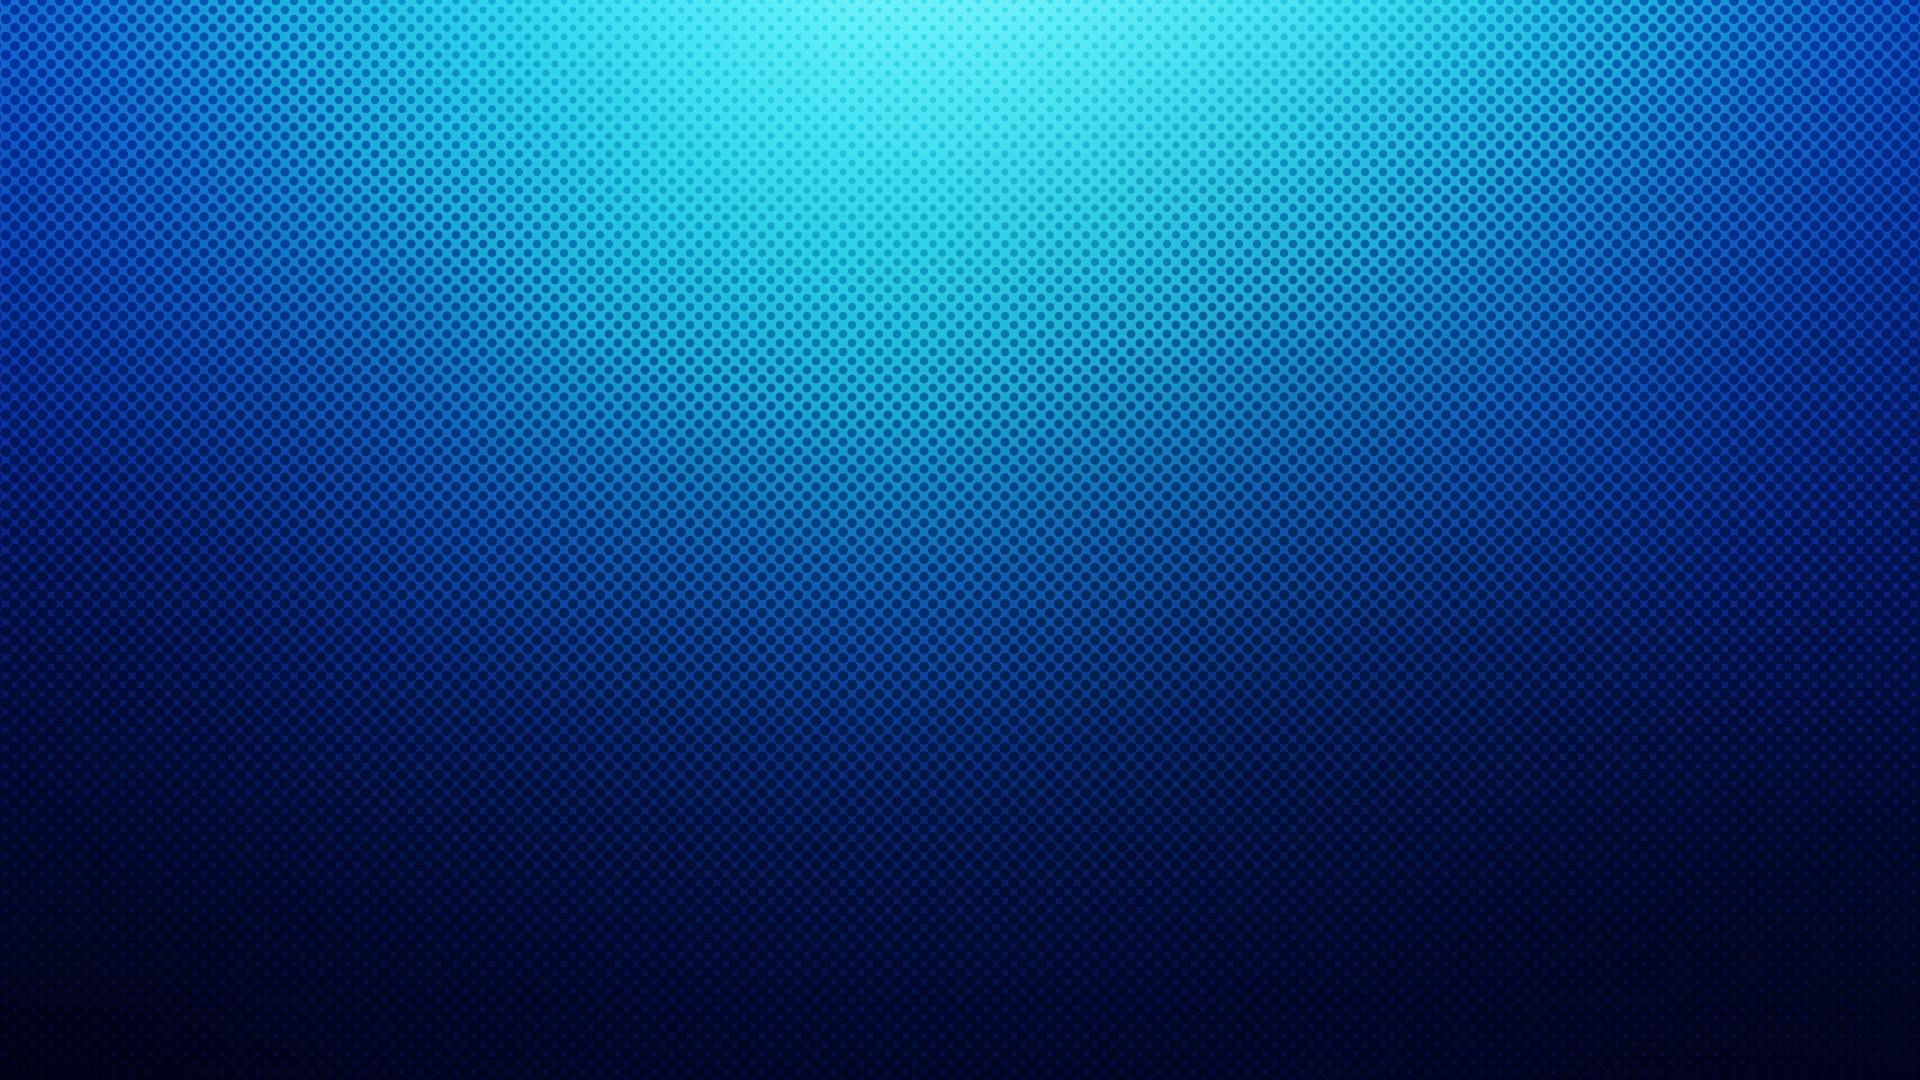 Dark Blue Desktop wallpaper